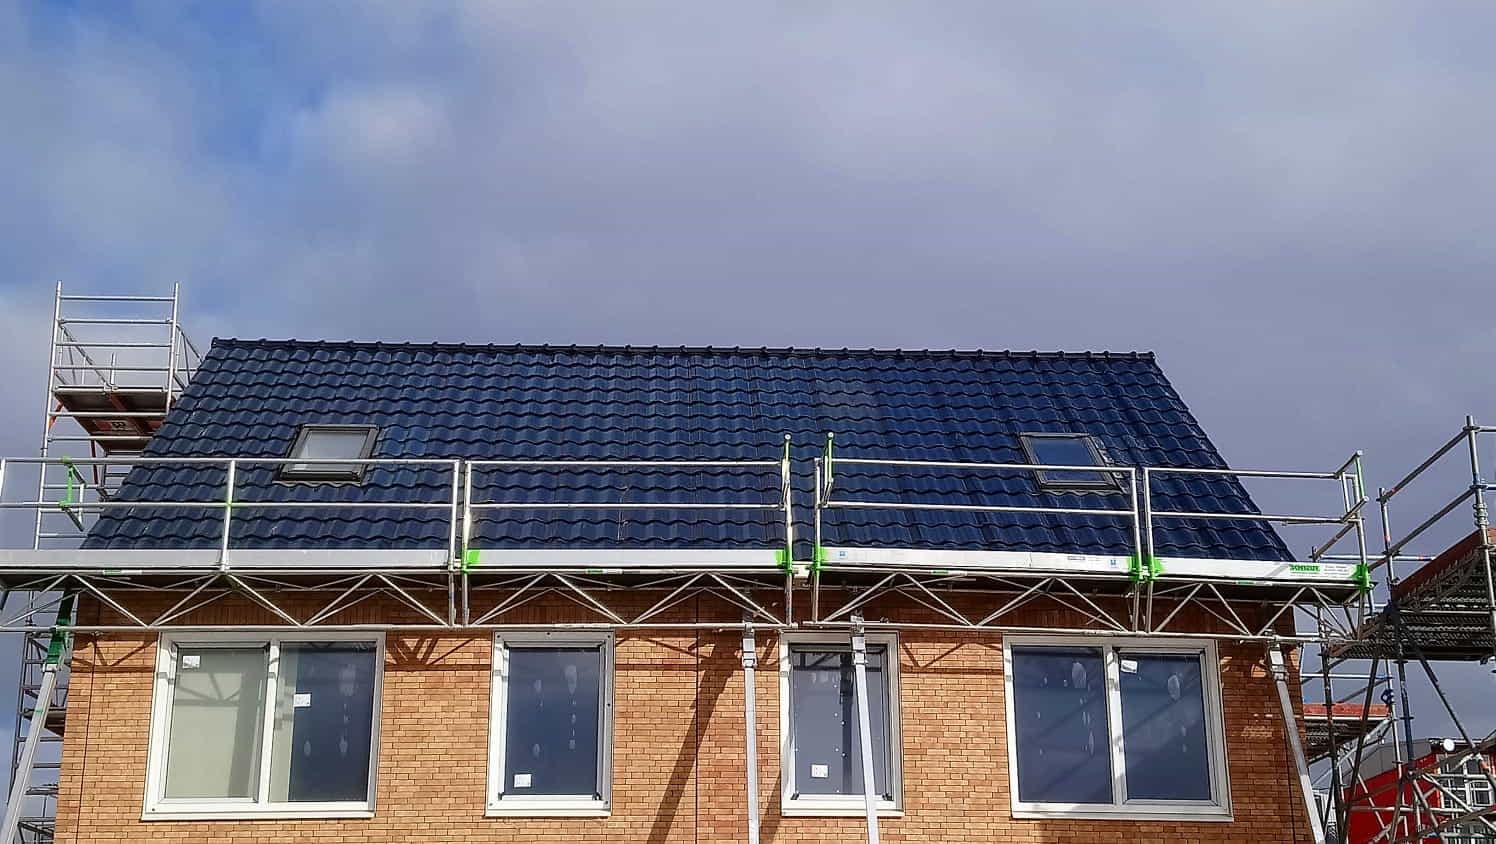 Loskade Groningen Van Wijnen Aberson Solar Hantile dakpannen steenstrips